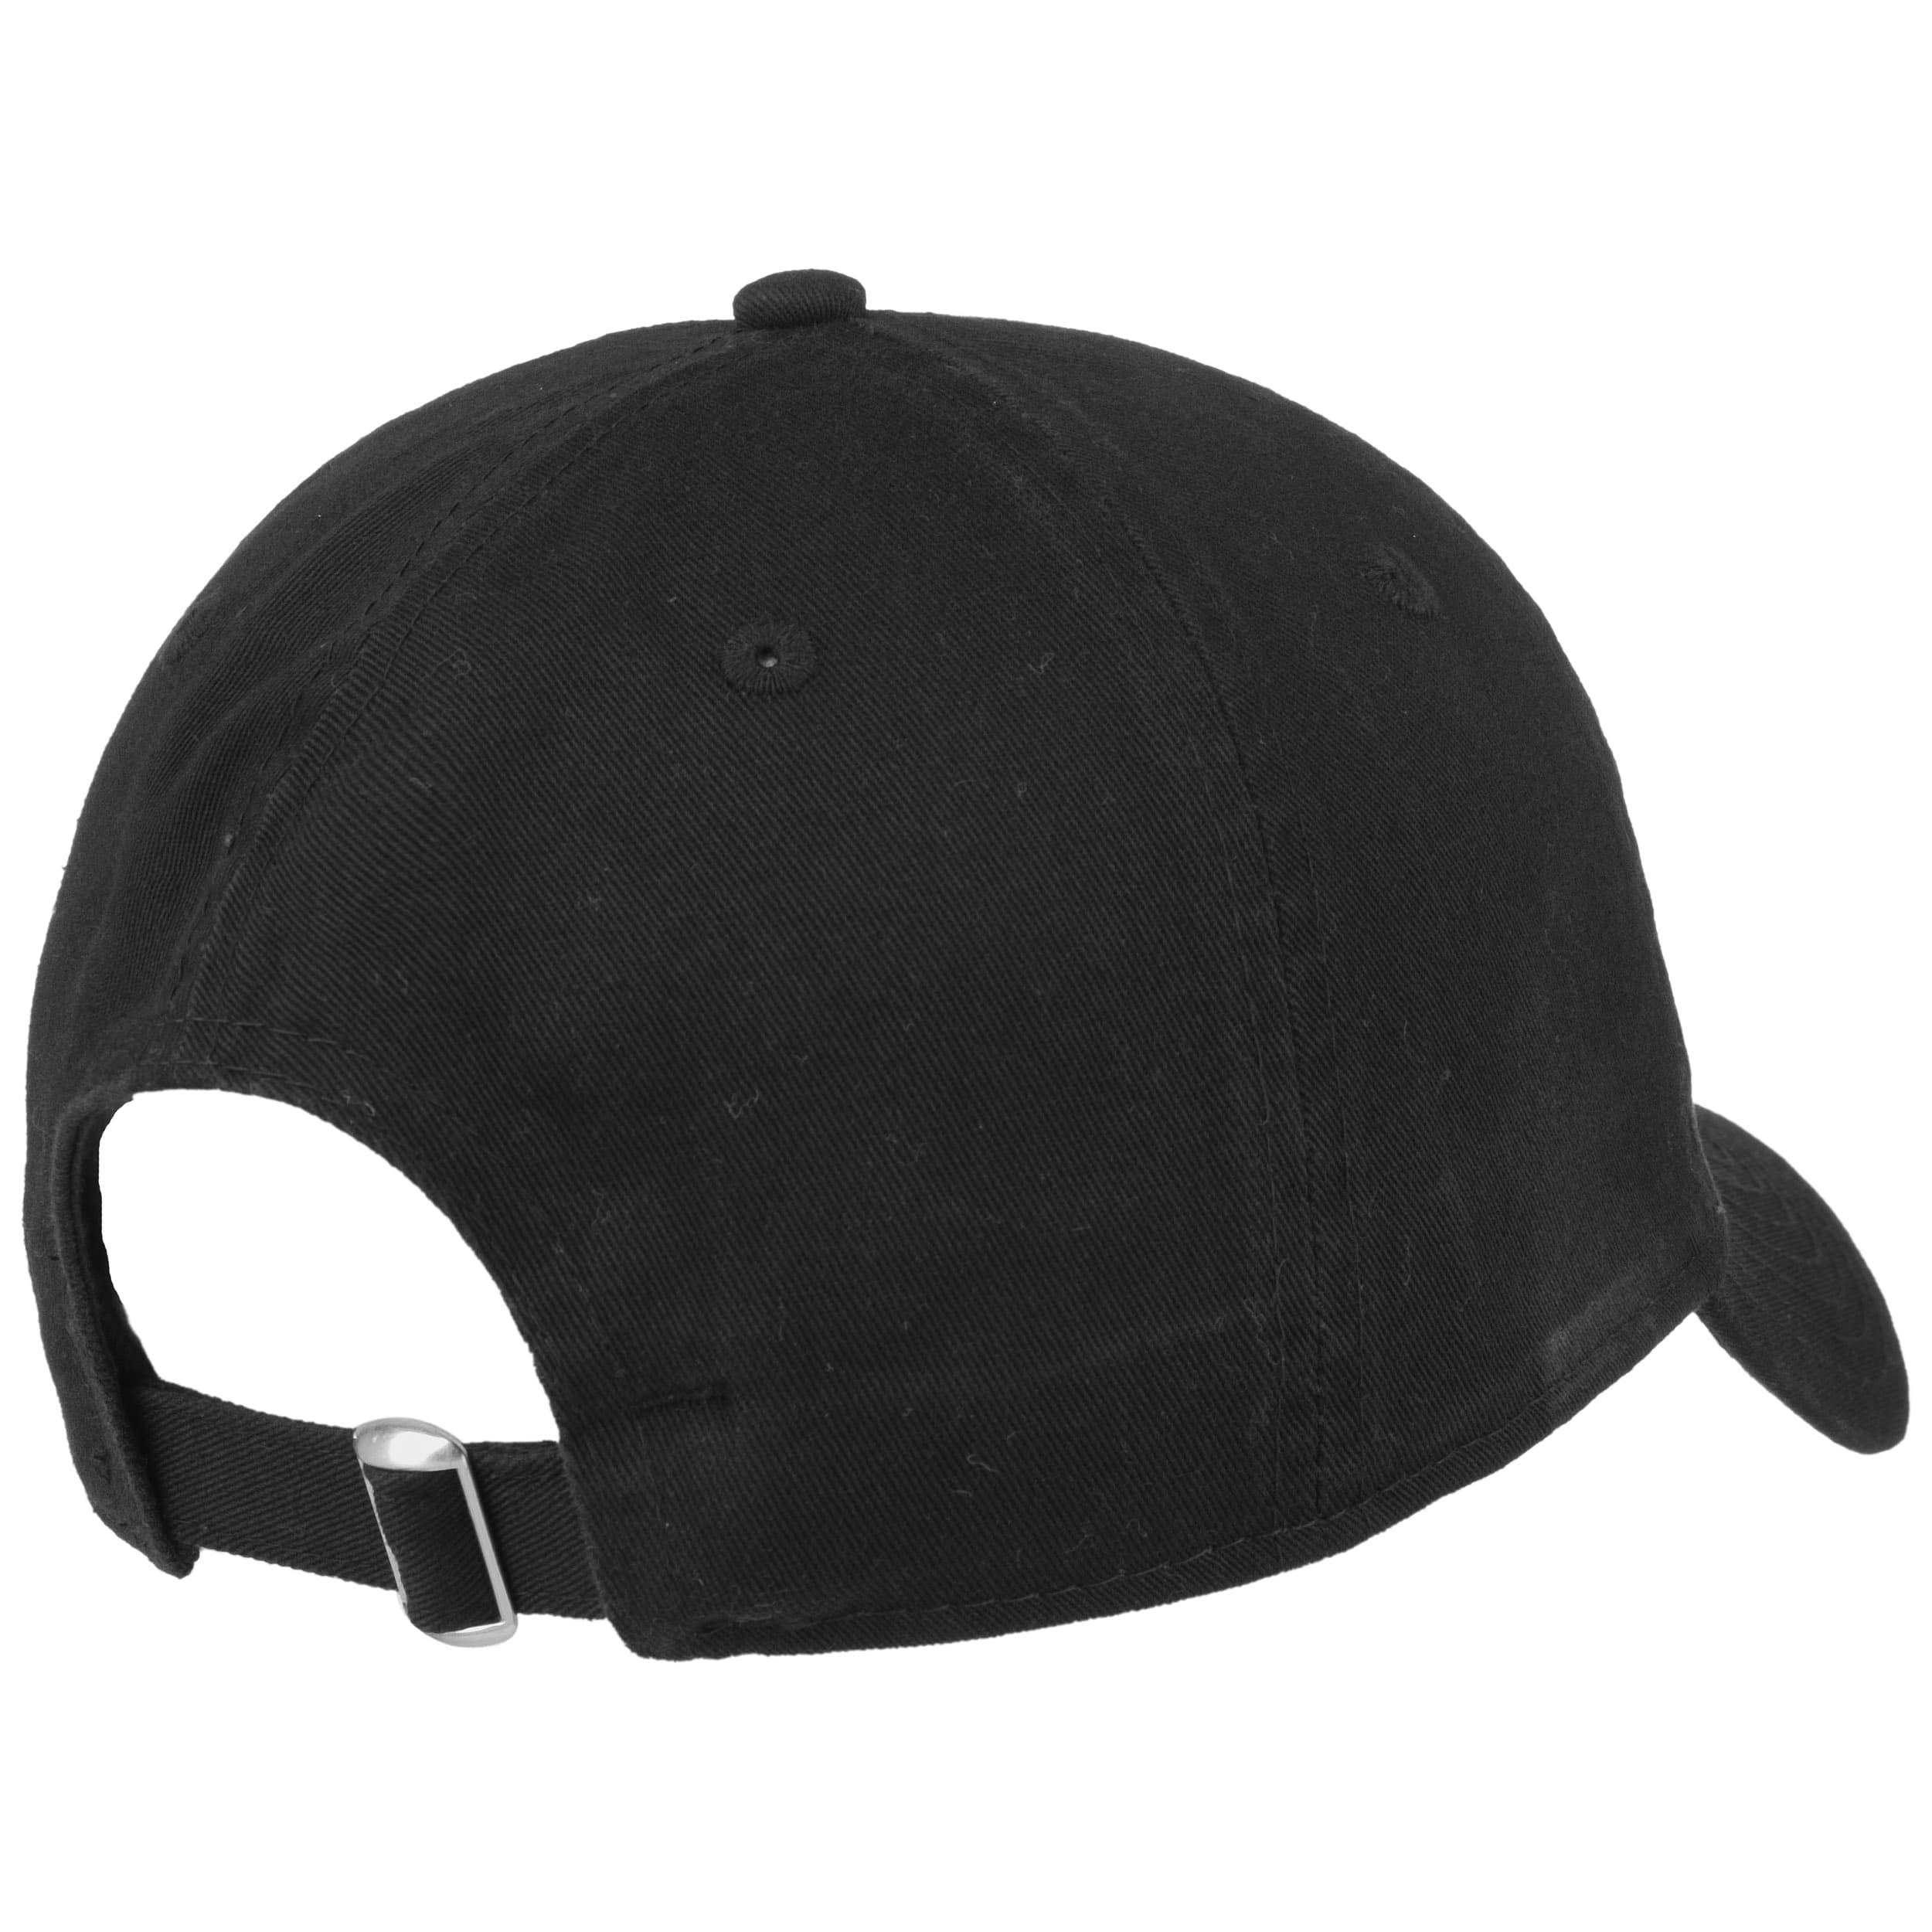 brand new 9596c 61107 ... cheap 9forty sunbleach la dodgers cap by new era black 3 724d0 1584d